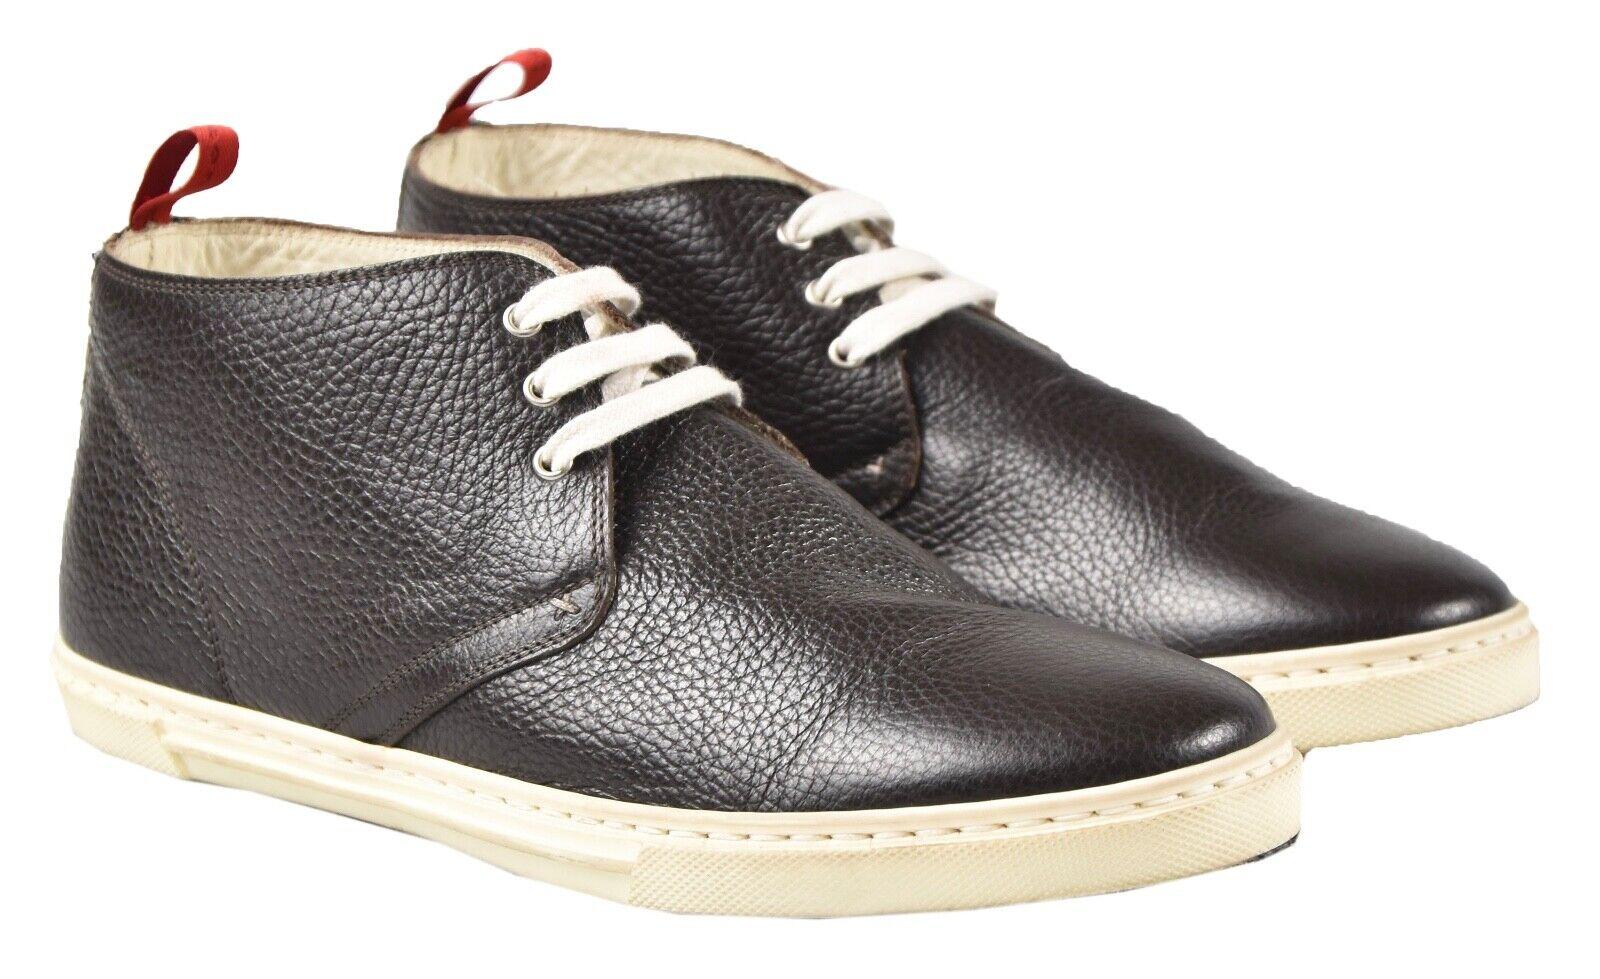 Vende Bien Completo Entrenadores Zapatos Nike Lunar Mont